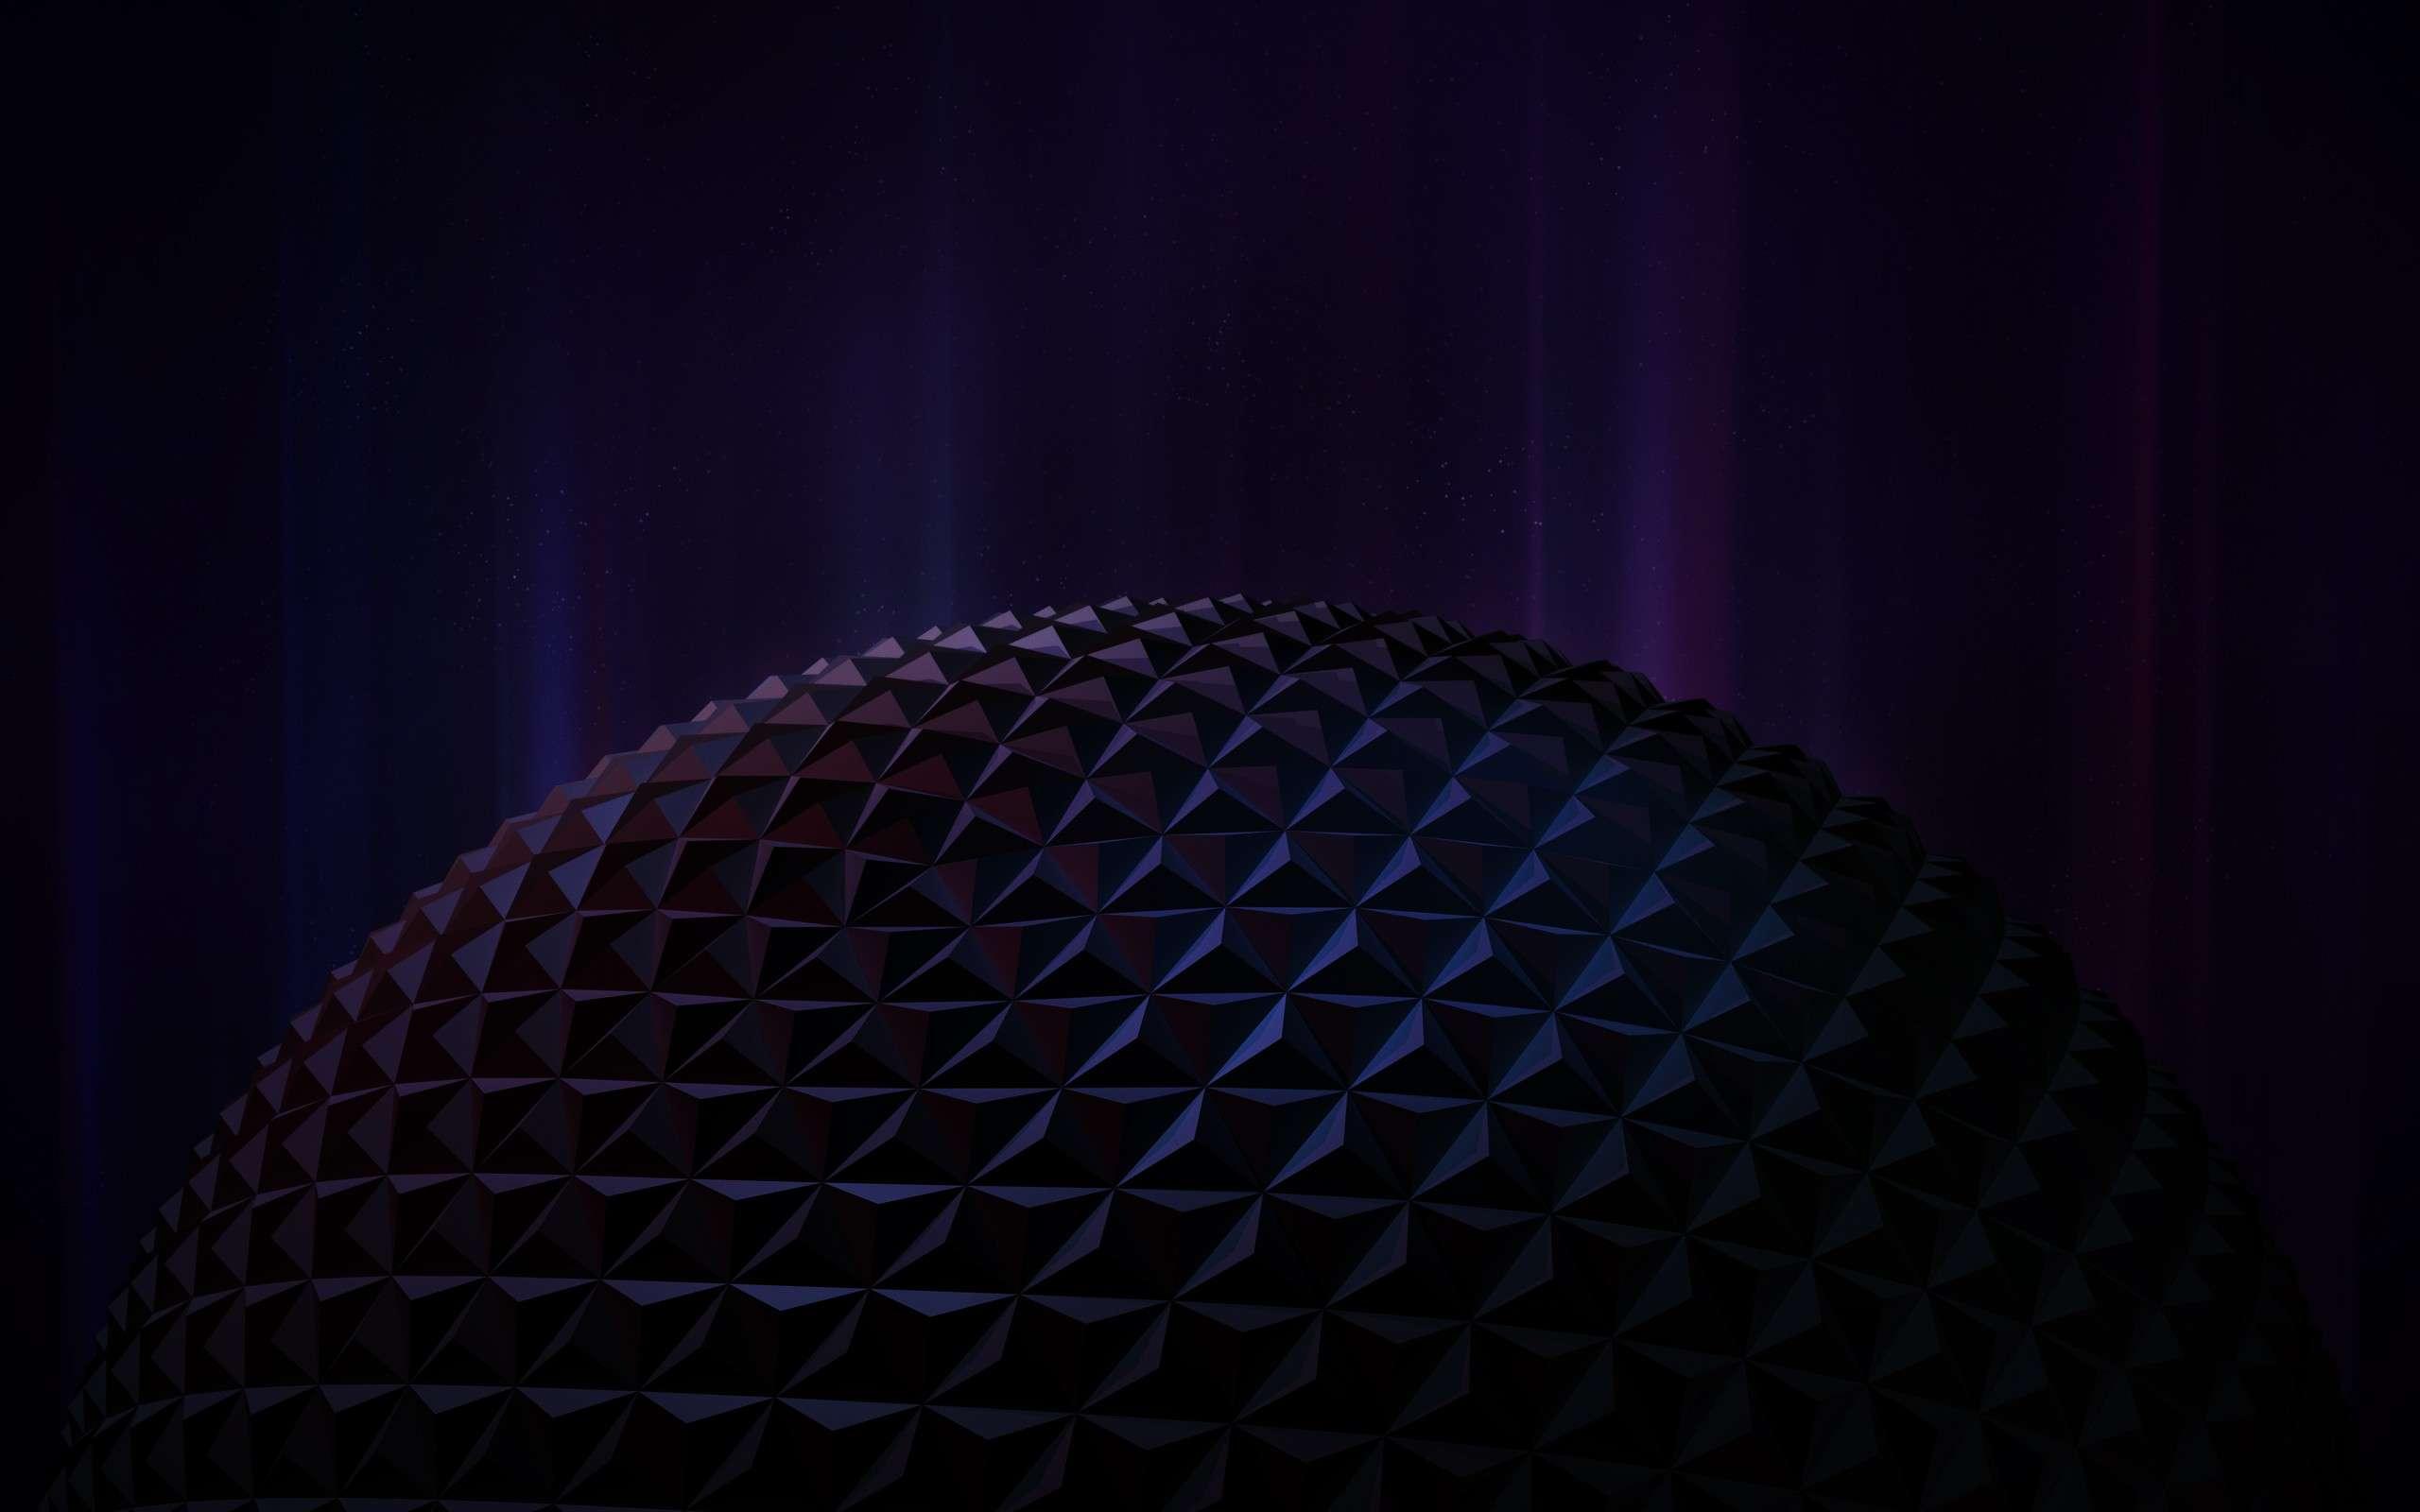 3D Abstract CGI Wallpaper 023